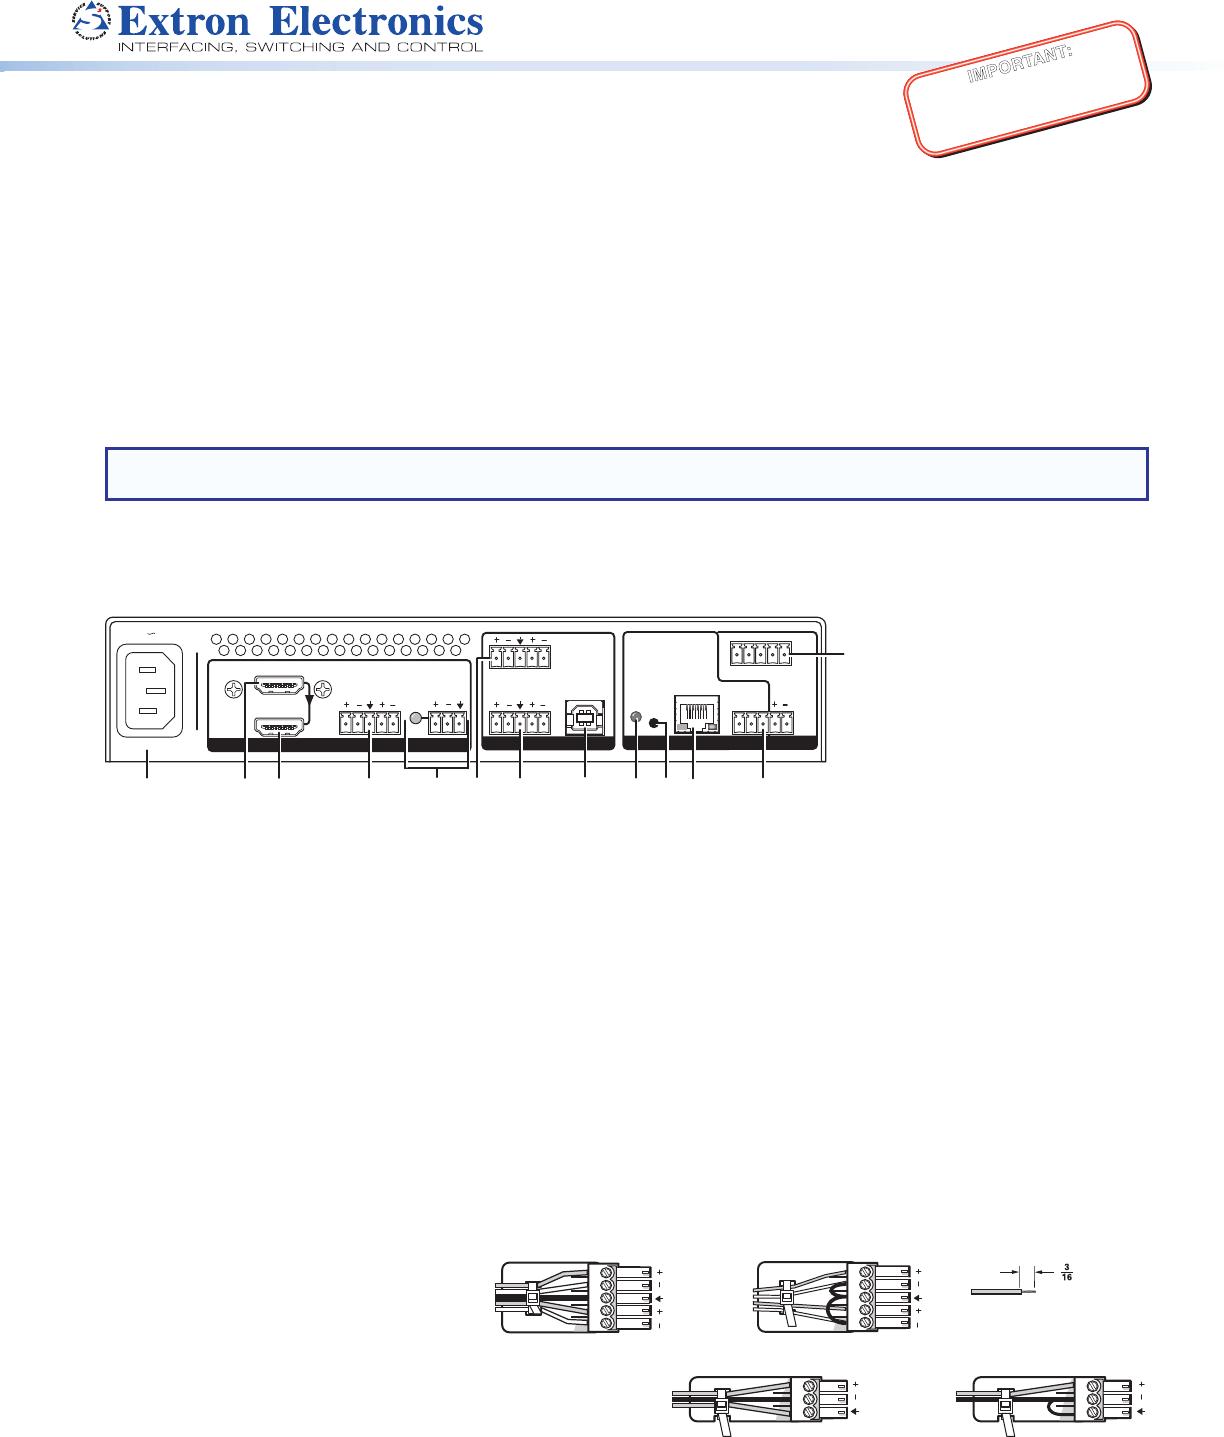 Extron Audio Wiring Diagram